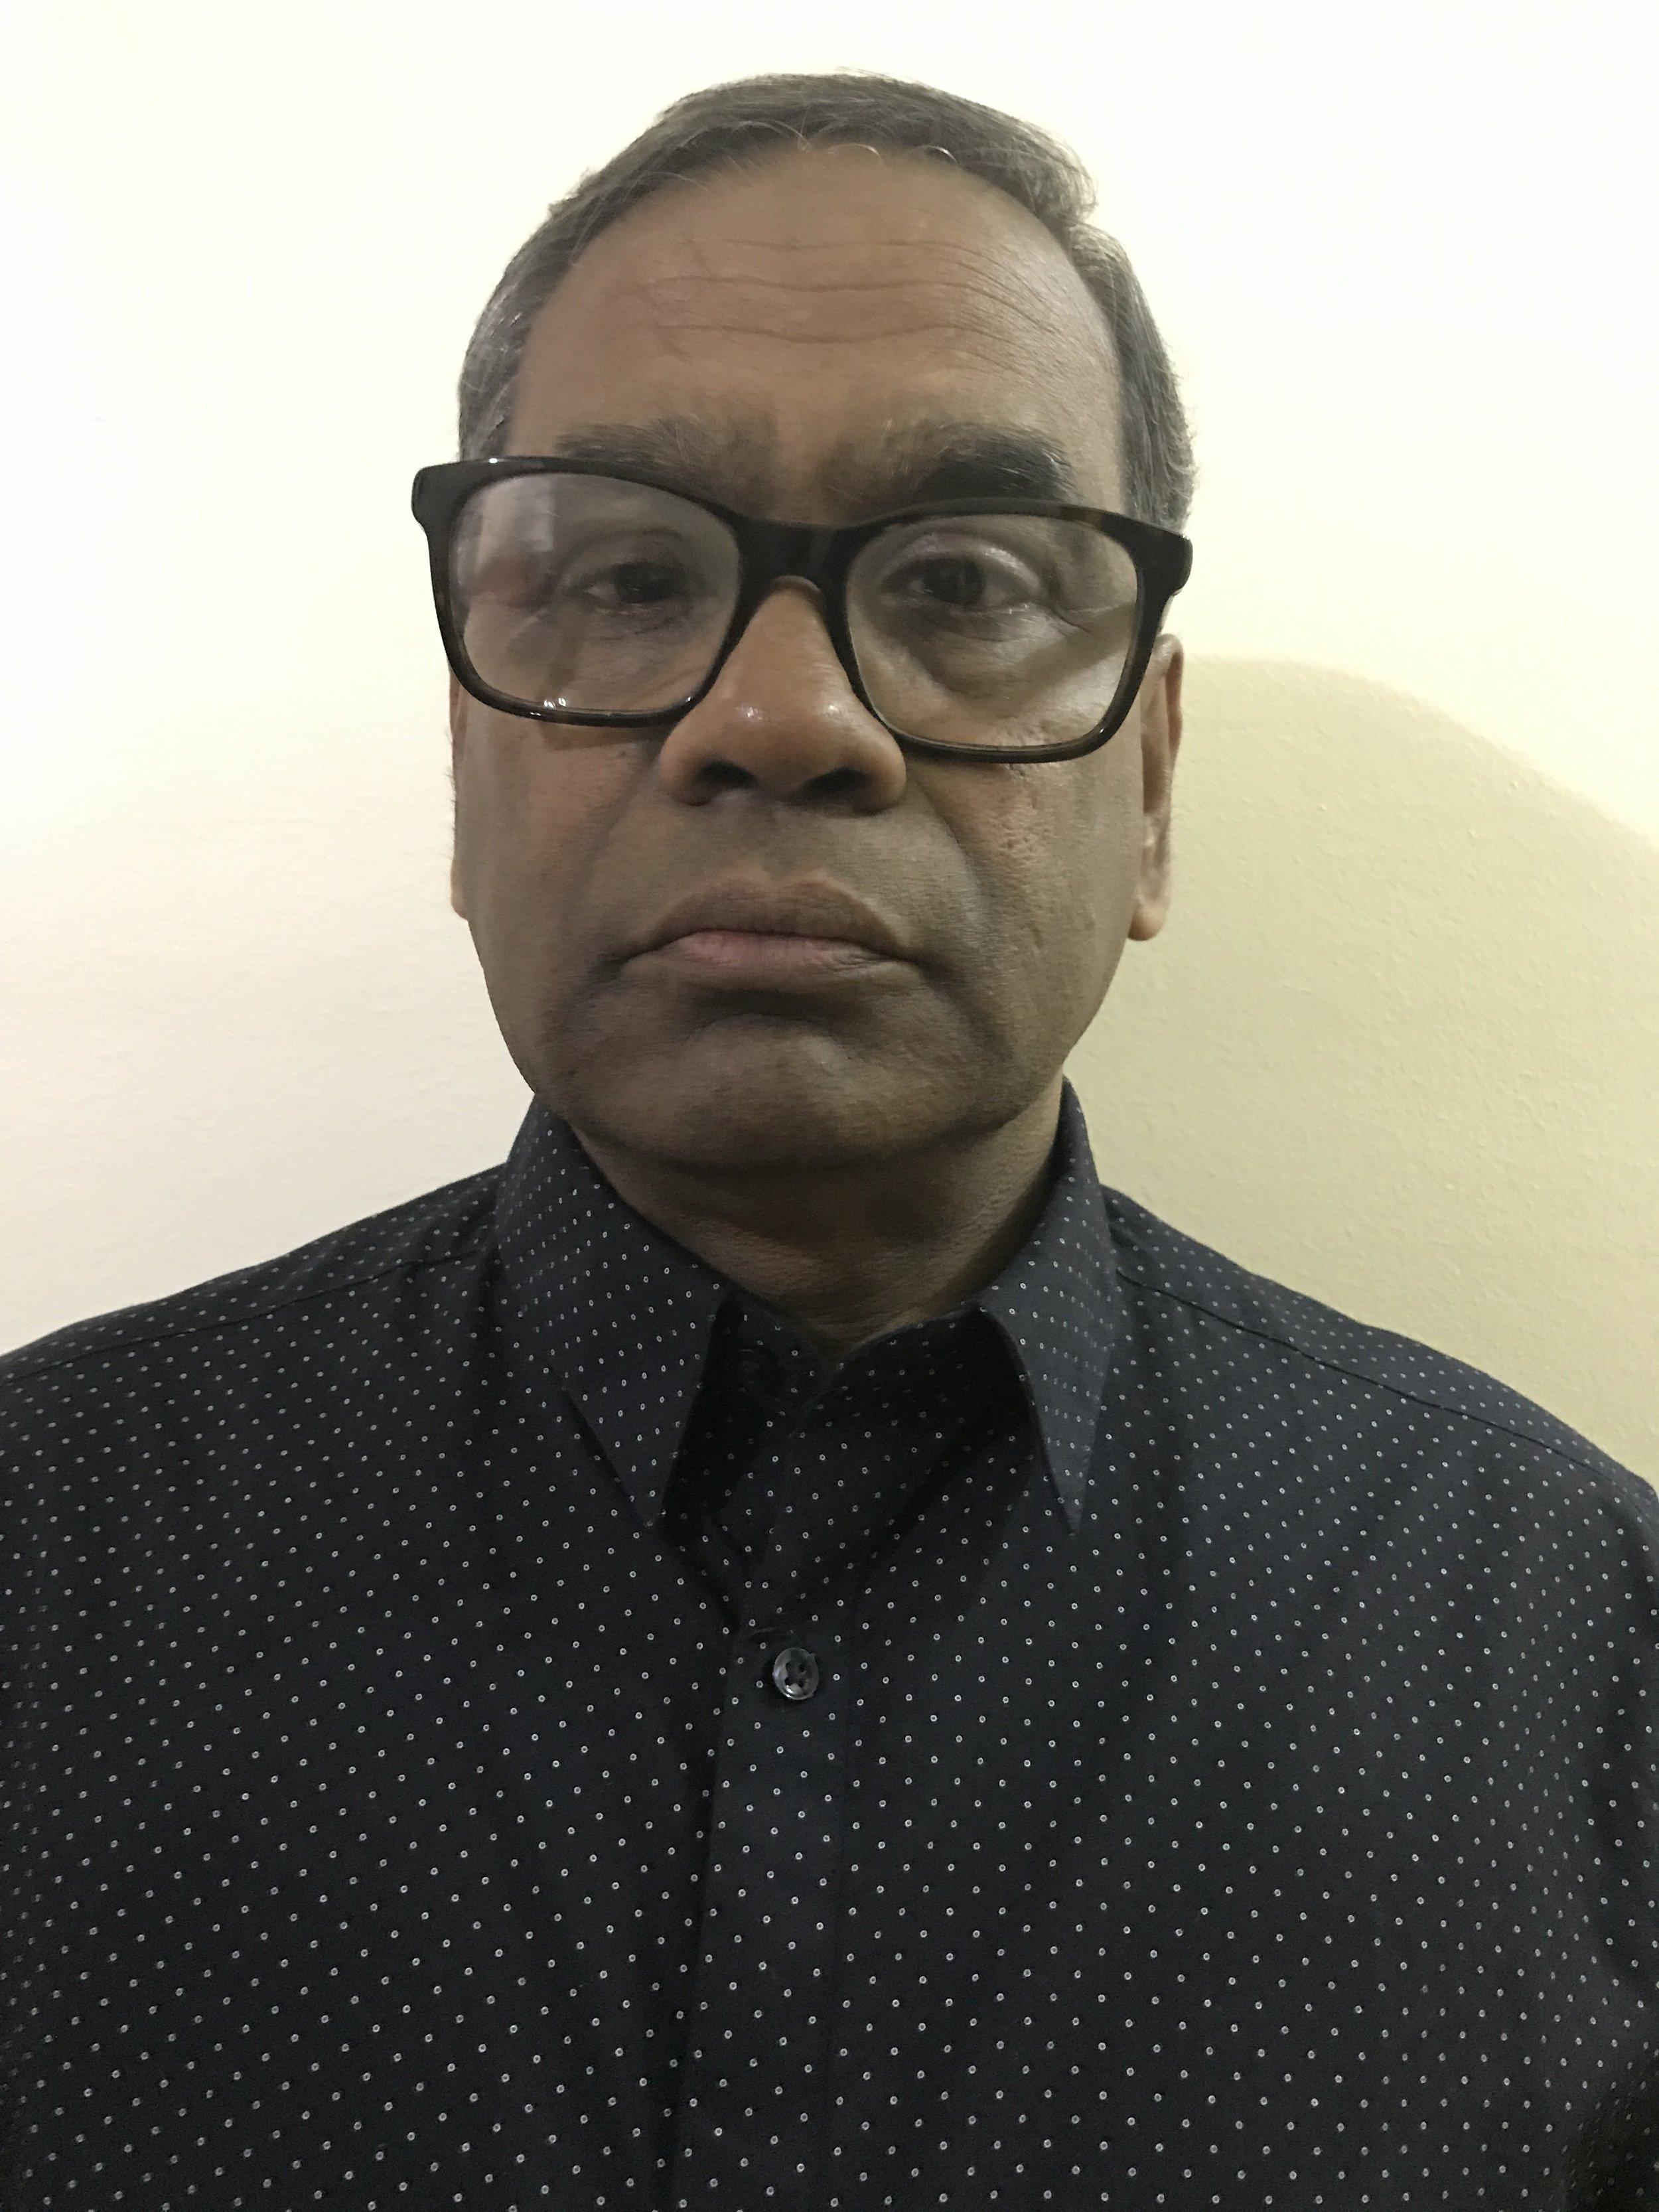 MD Asaduzzaman   Jackson Heights, Queens, NY